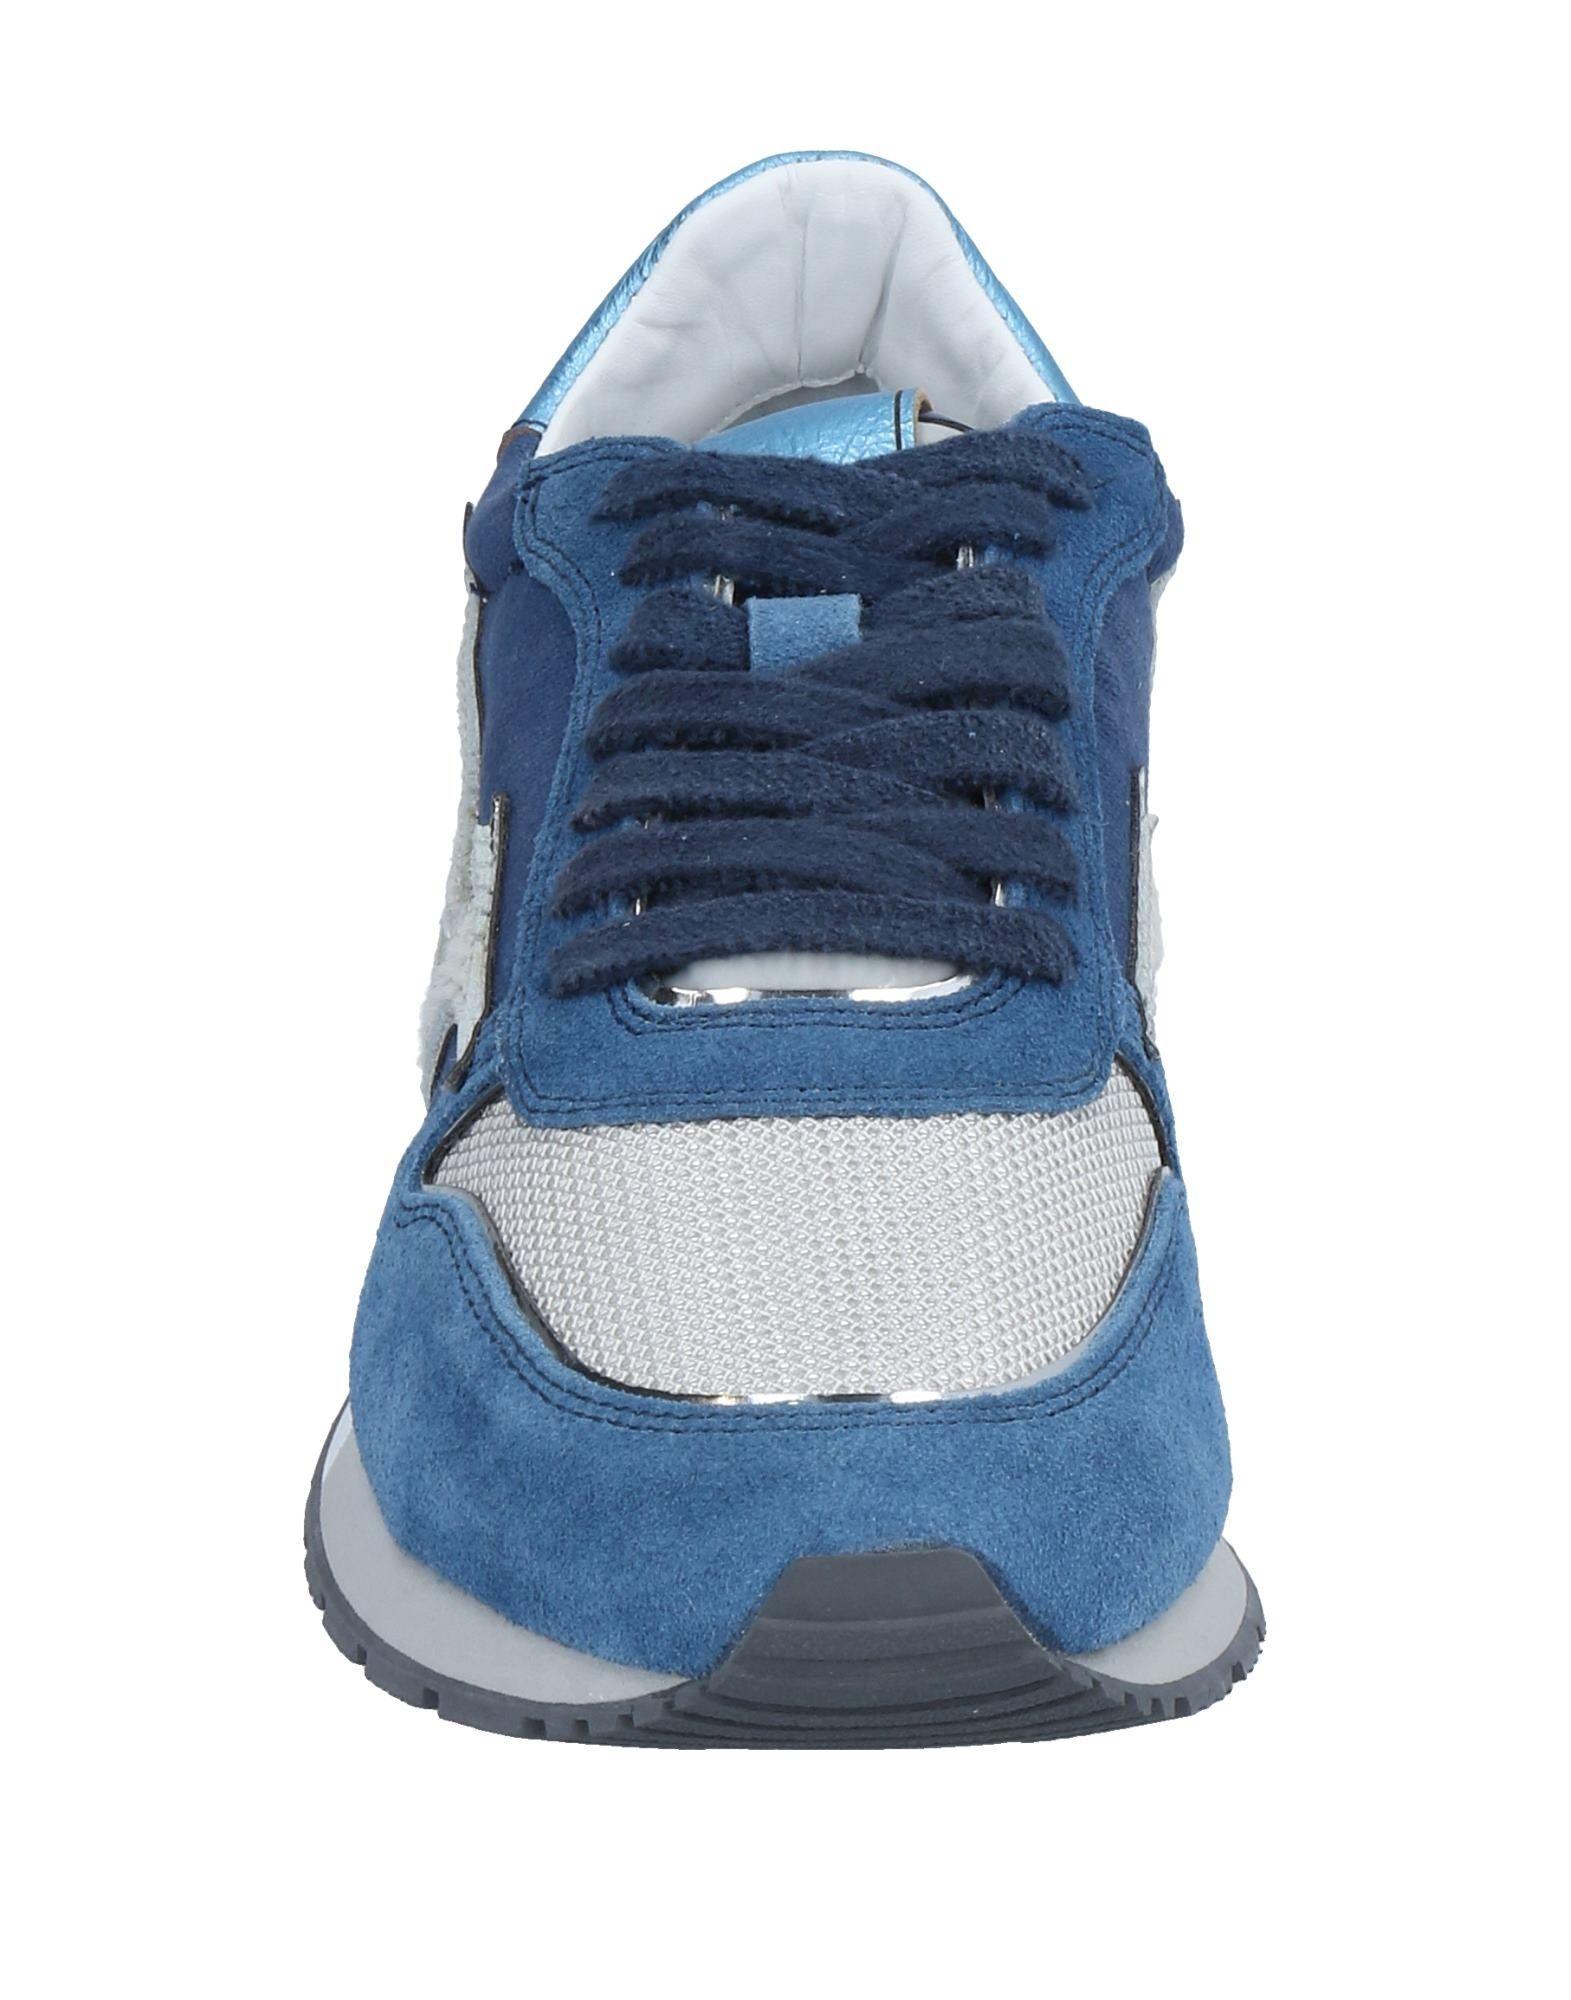 Mizuno Sneakers Damen  11528086TL Gute Qualität beliebte Schuhe